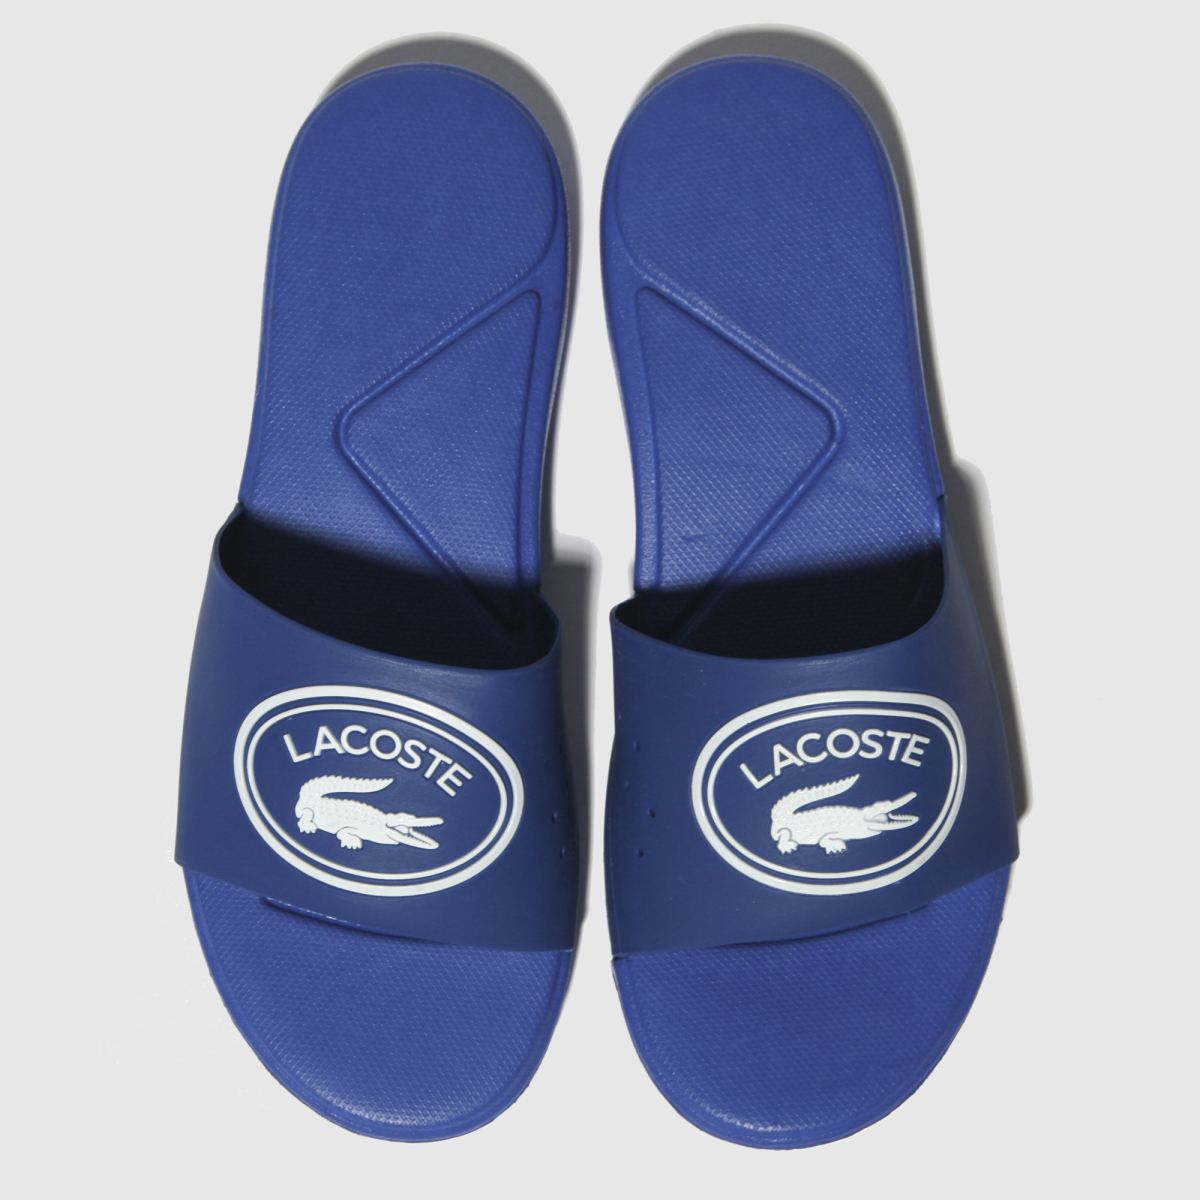 Lacoste Blue L.30 Slide Sandals Youth